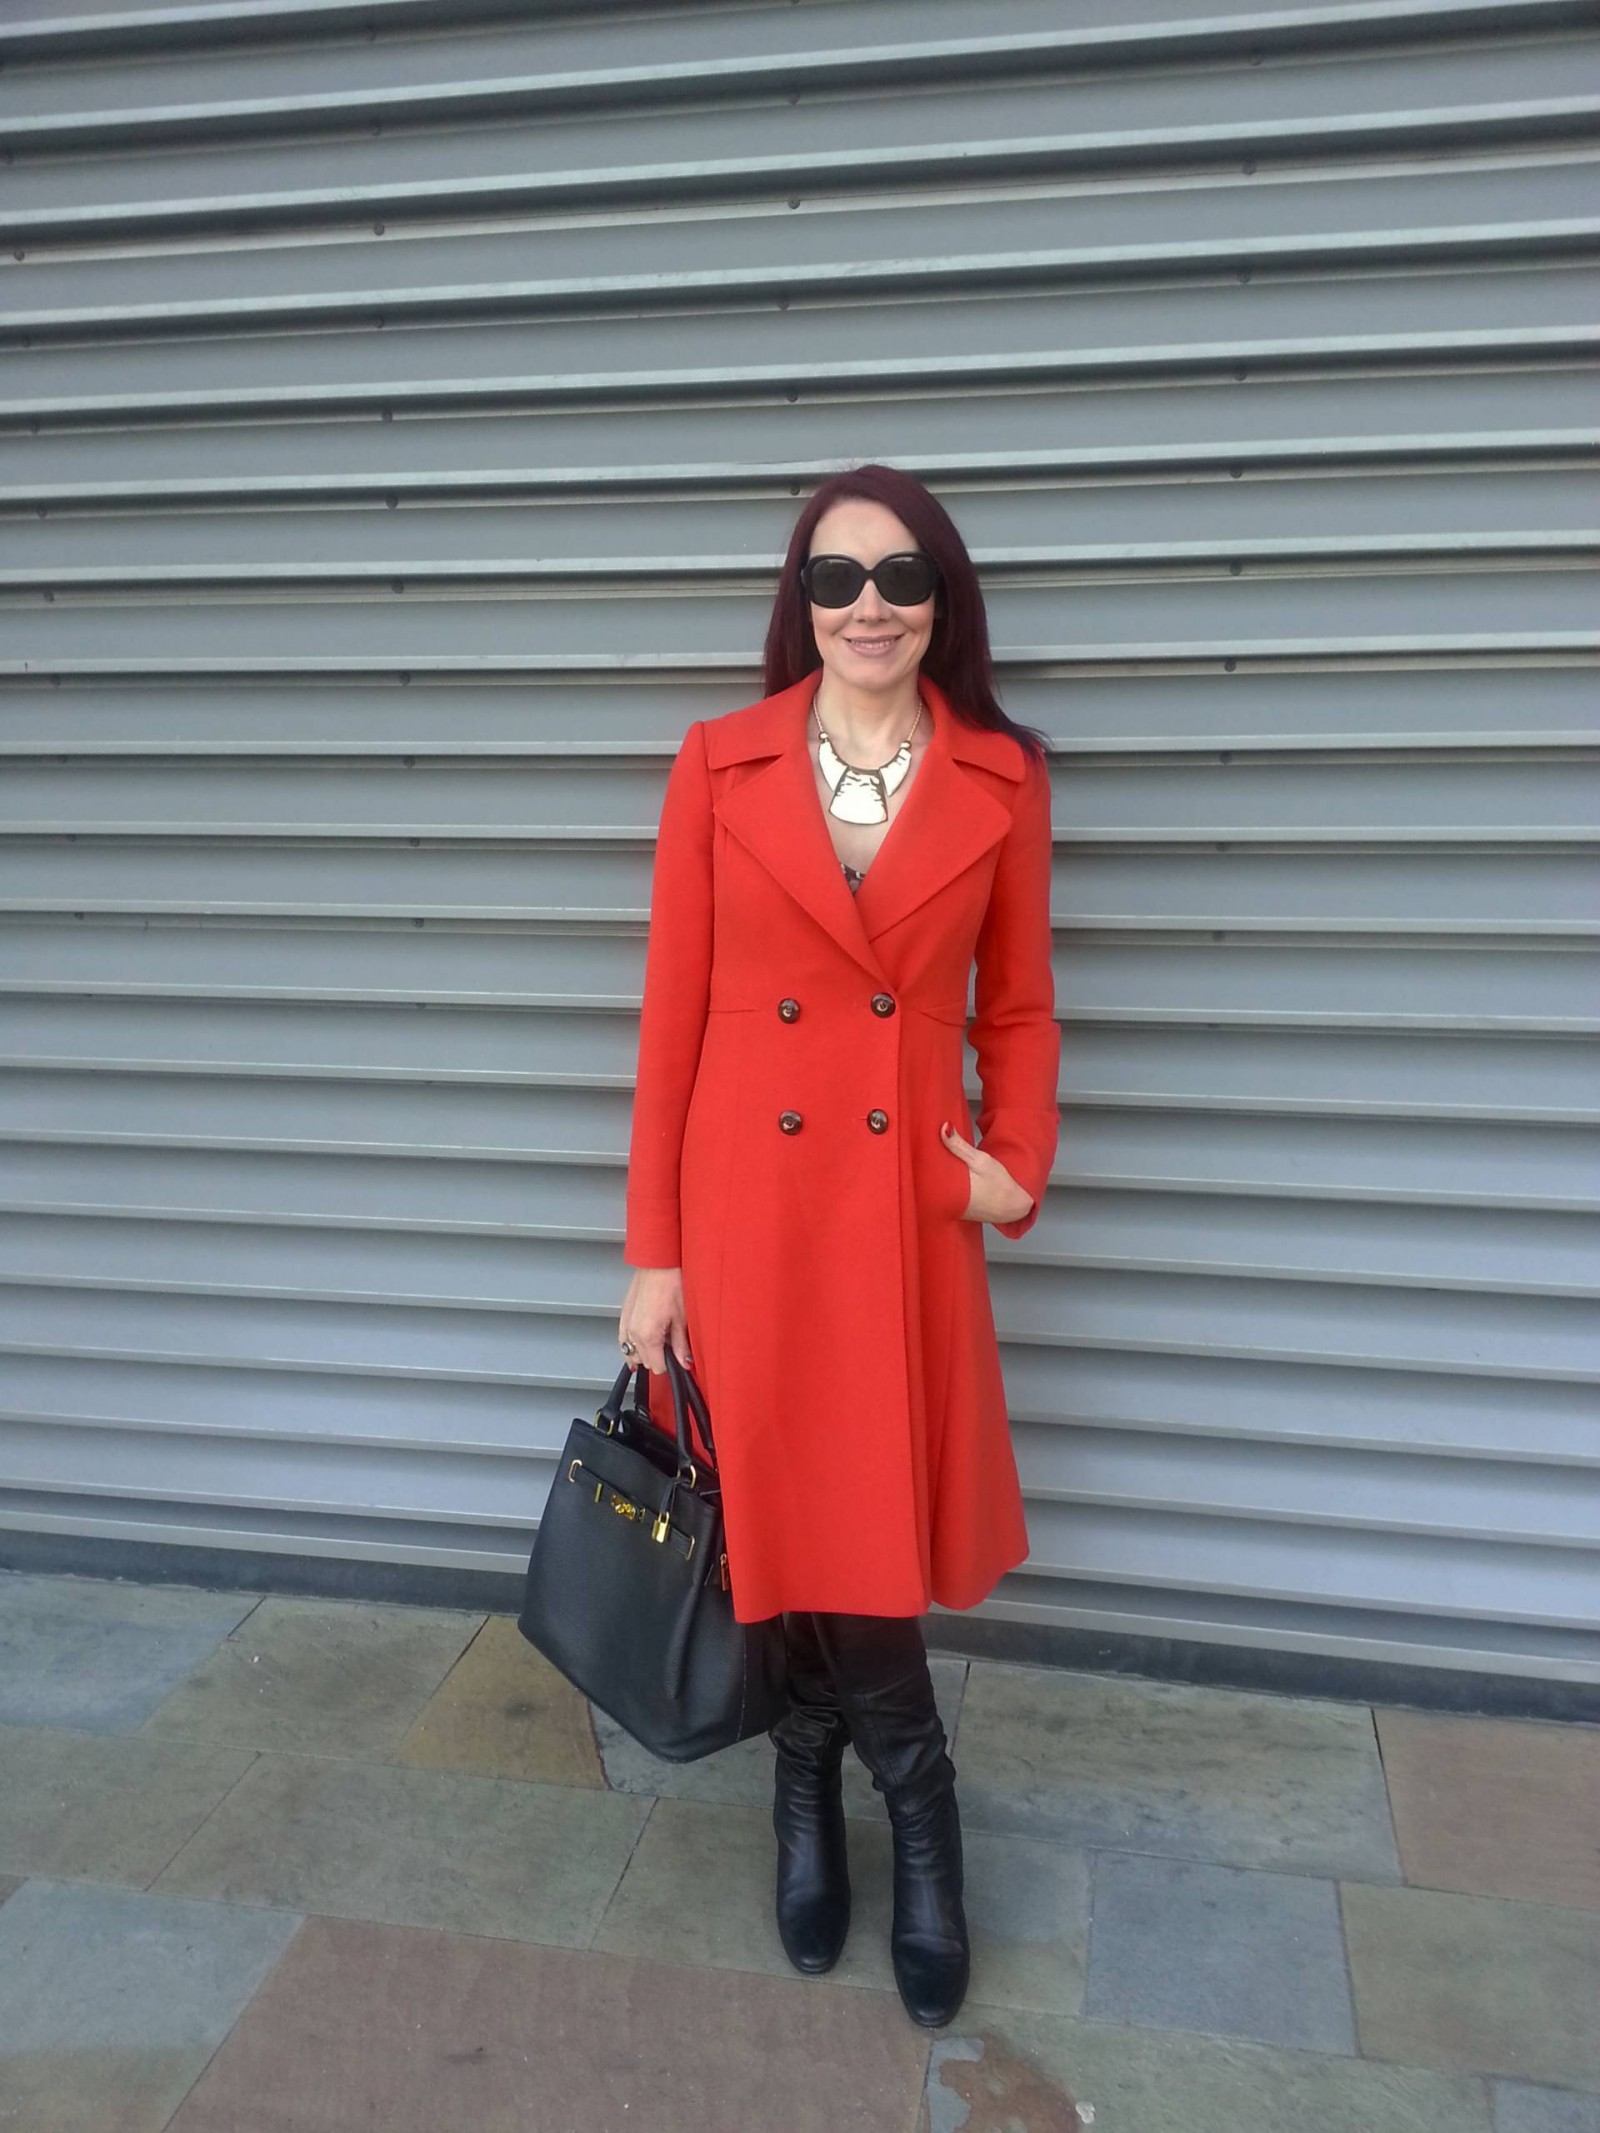 Red Jasper Conran Debenhams coat